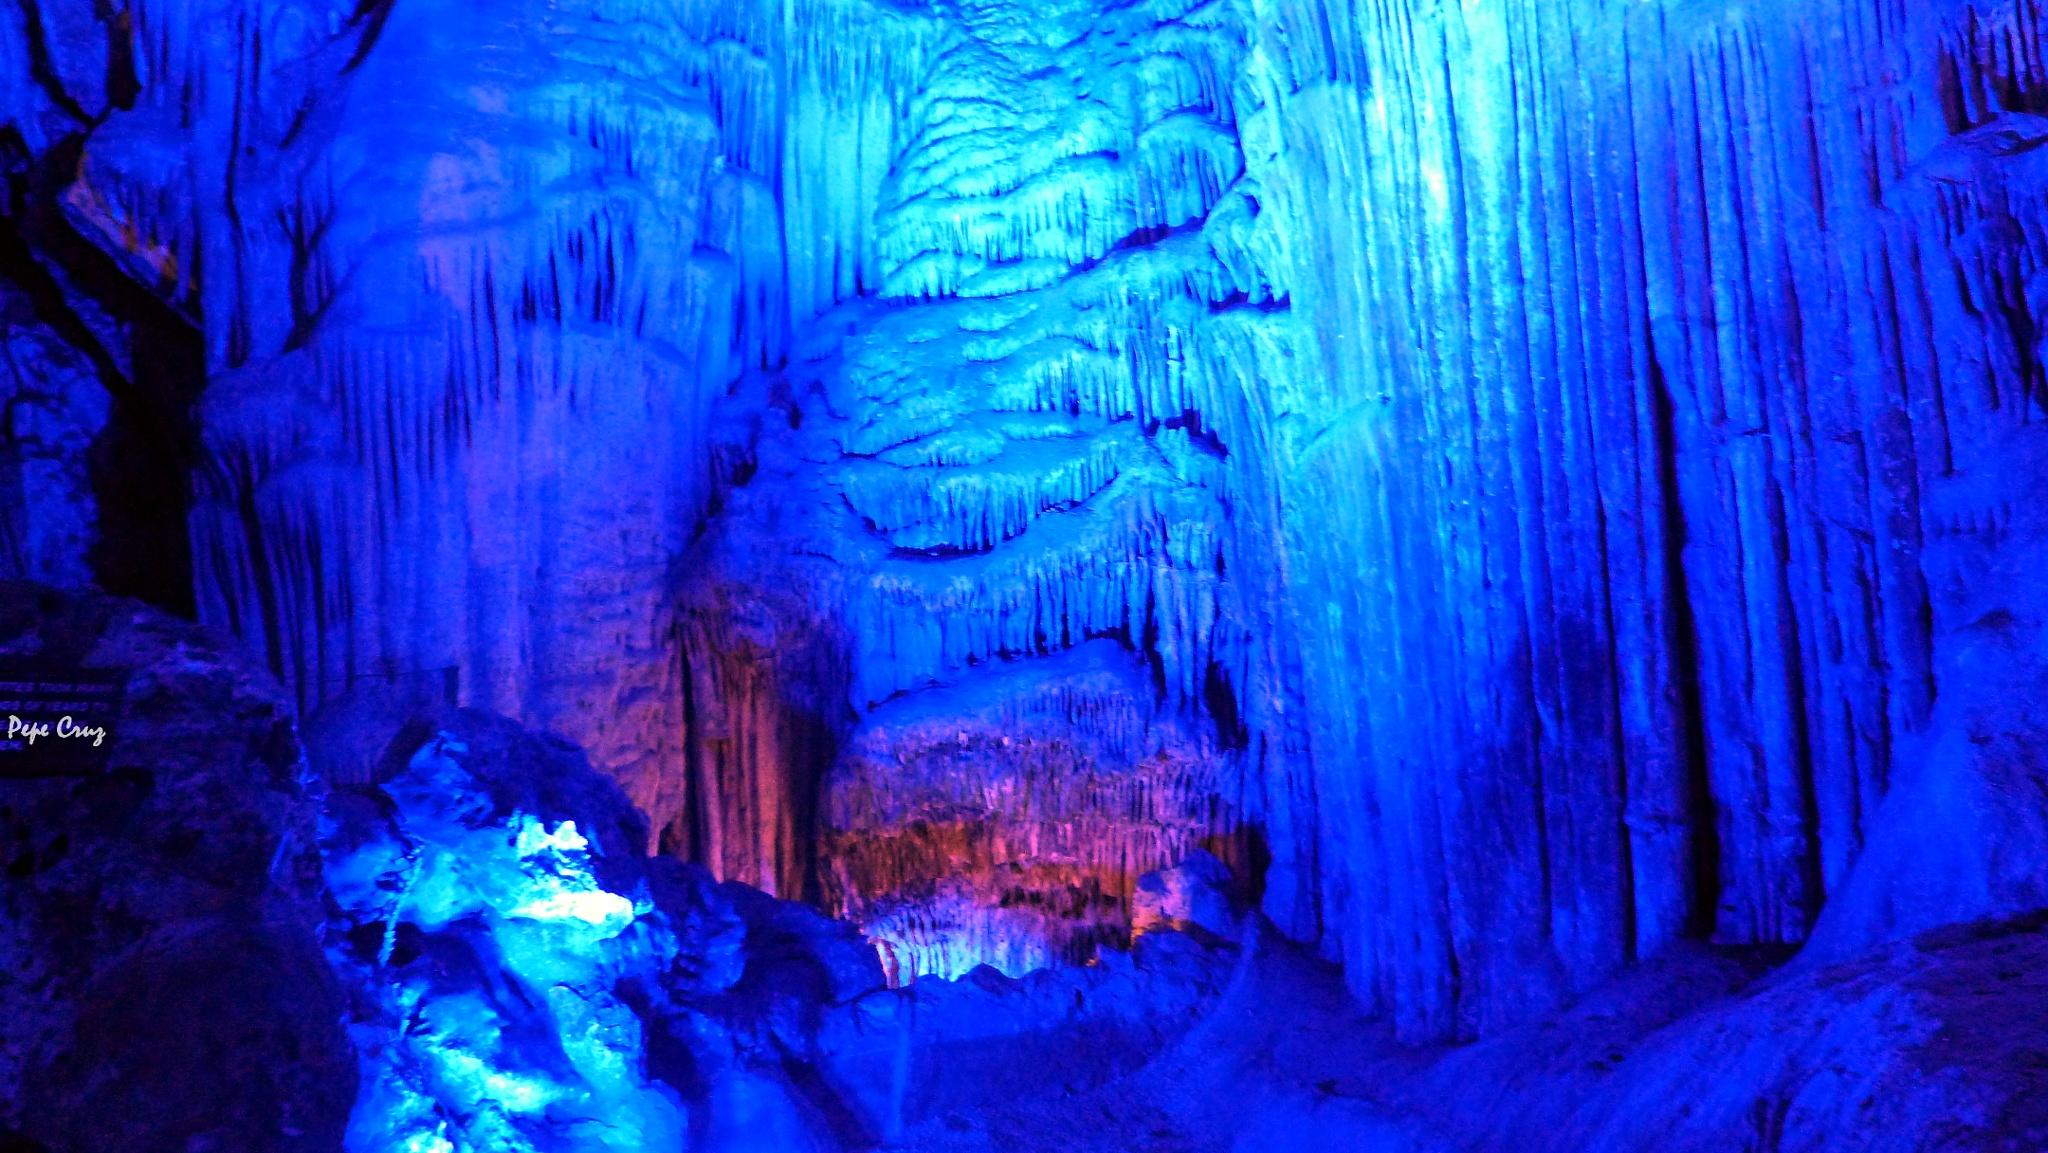 La Cueva II by Pepe Cruz